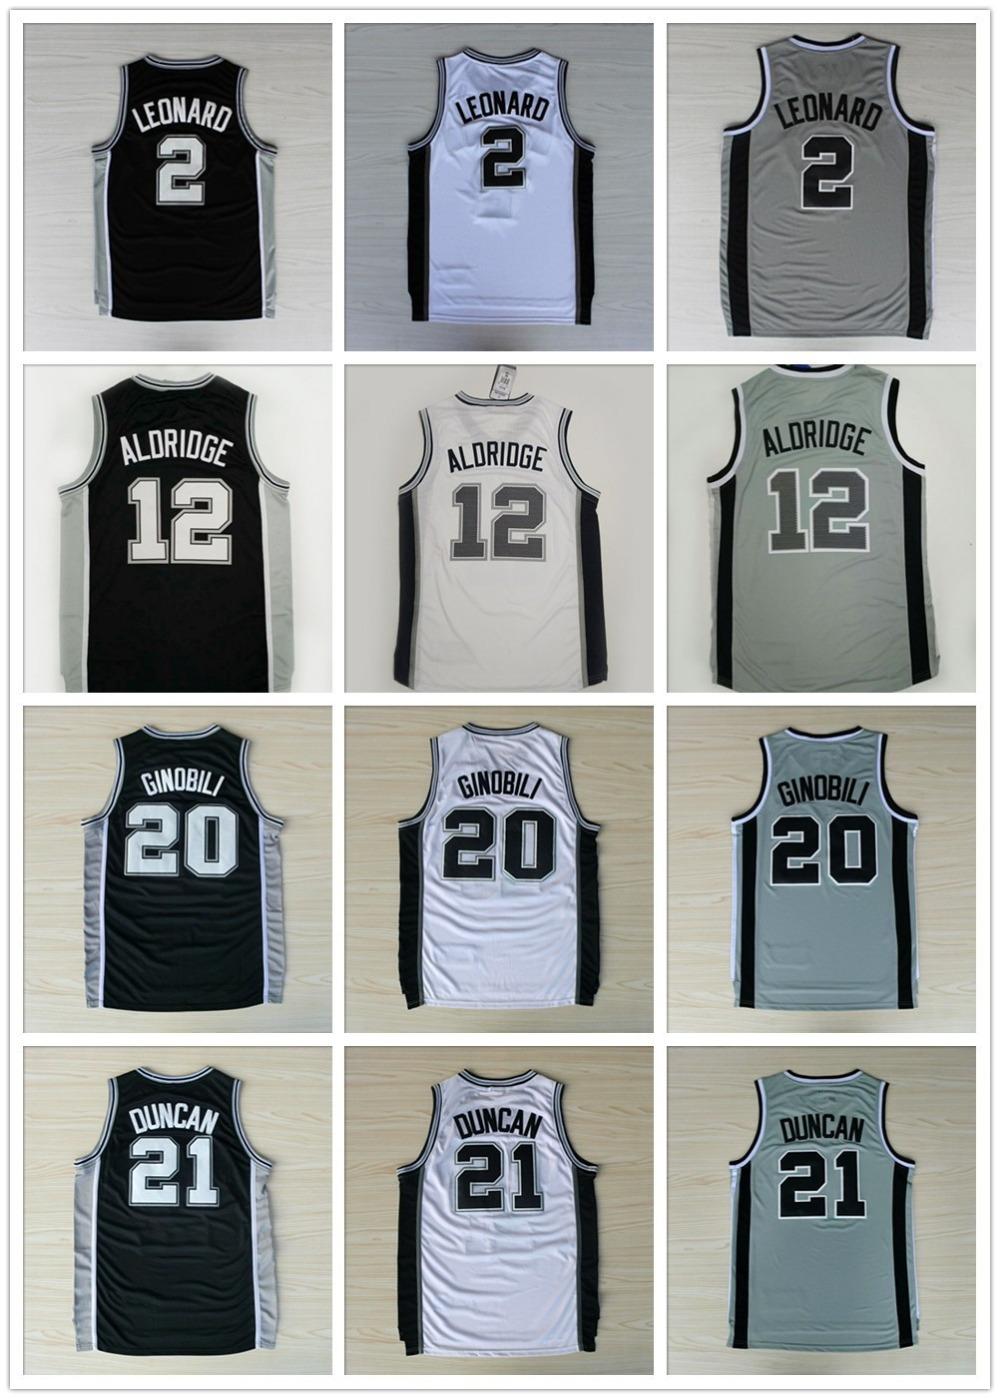 lamarcus aldridge Jersey Cheap Basketball jersey Tim Duncan Jersey Tony Parker Manu Ginobili Kawhi Leonard Jersey(China (Mainland))